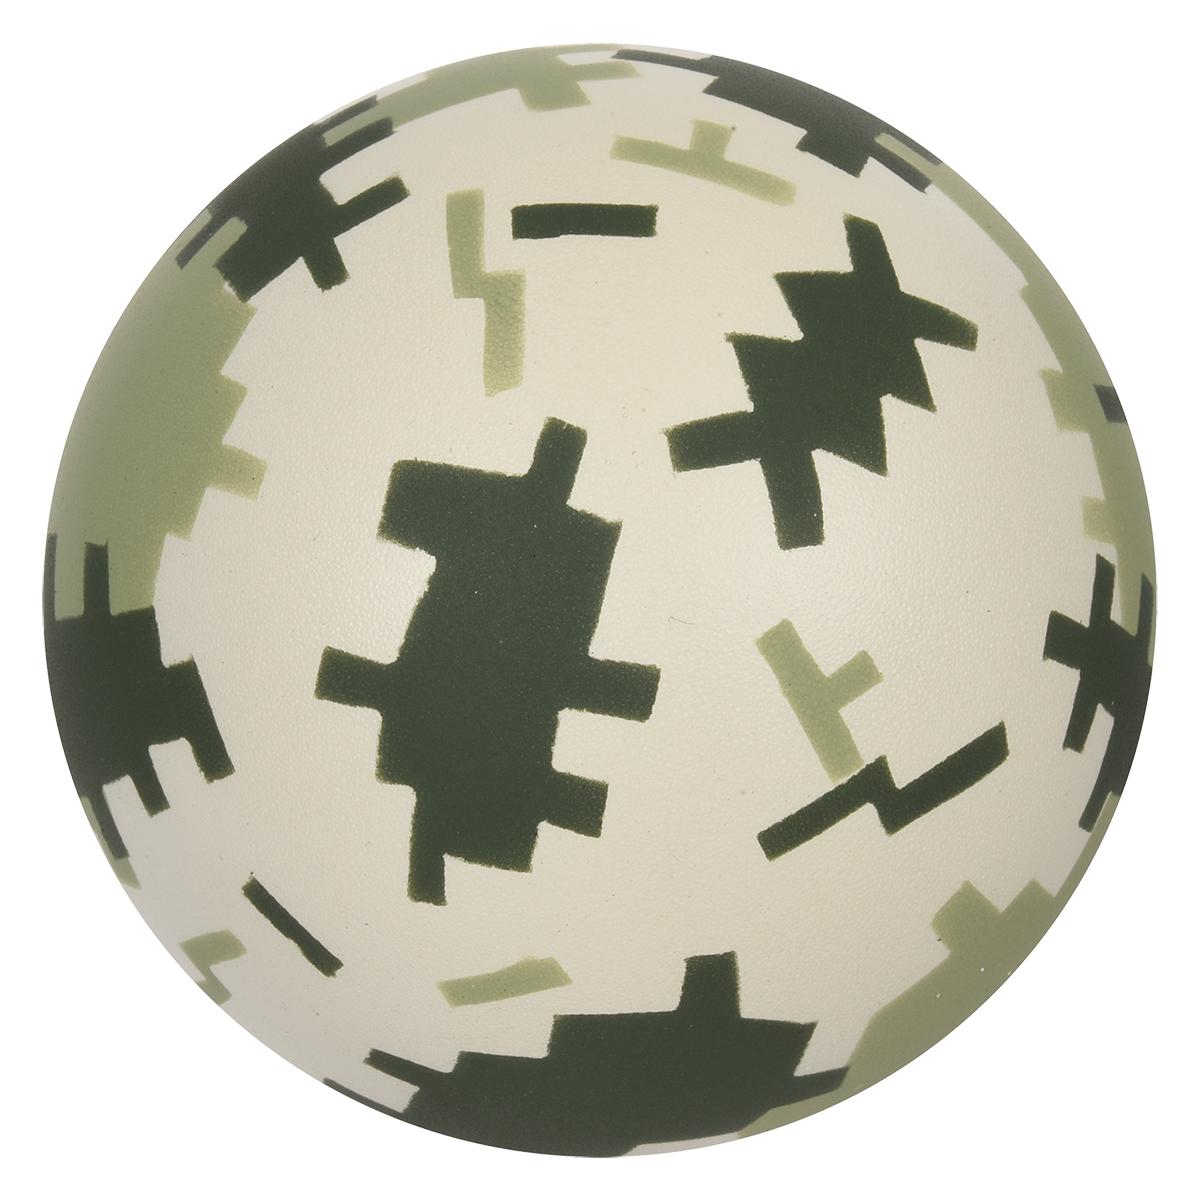 4092 - Pelota anti-estrés tonos camuflaje